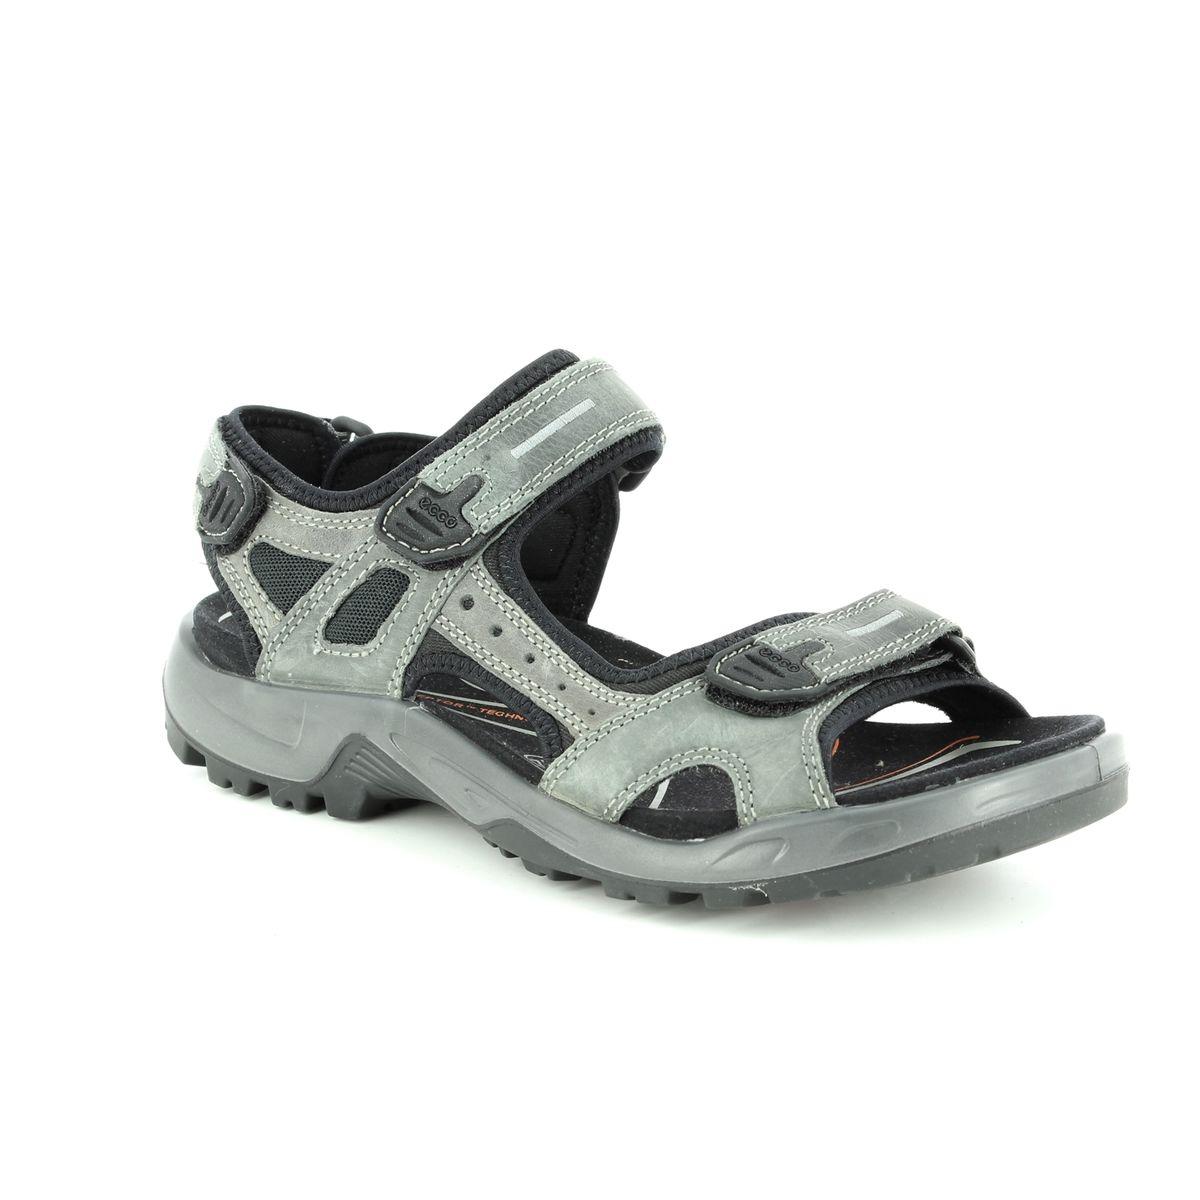 ecco sandals.ie